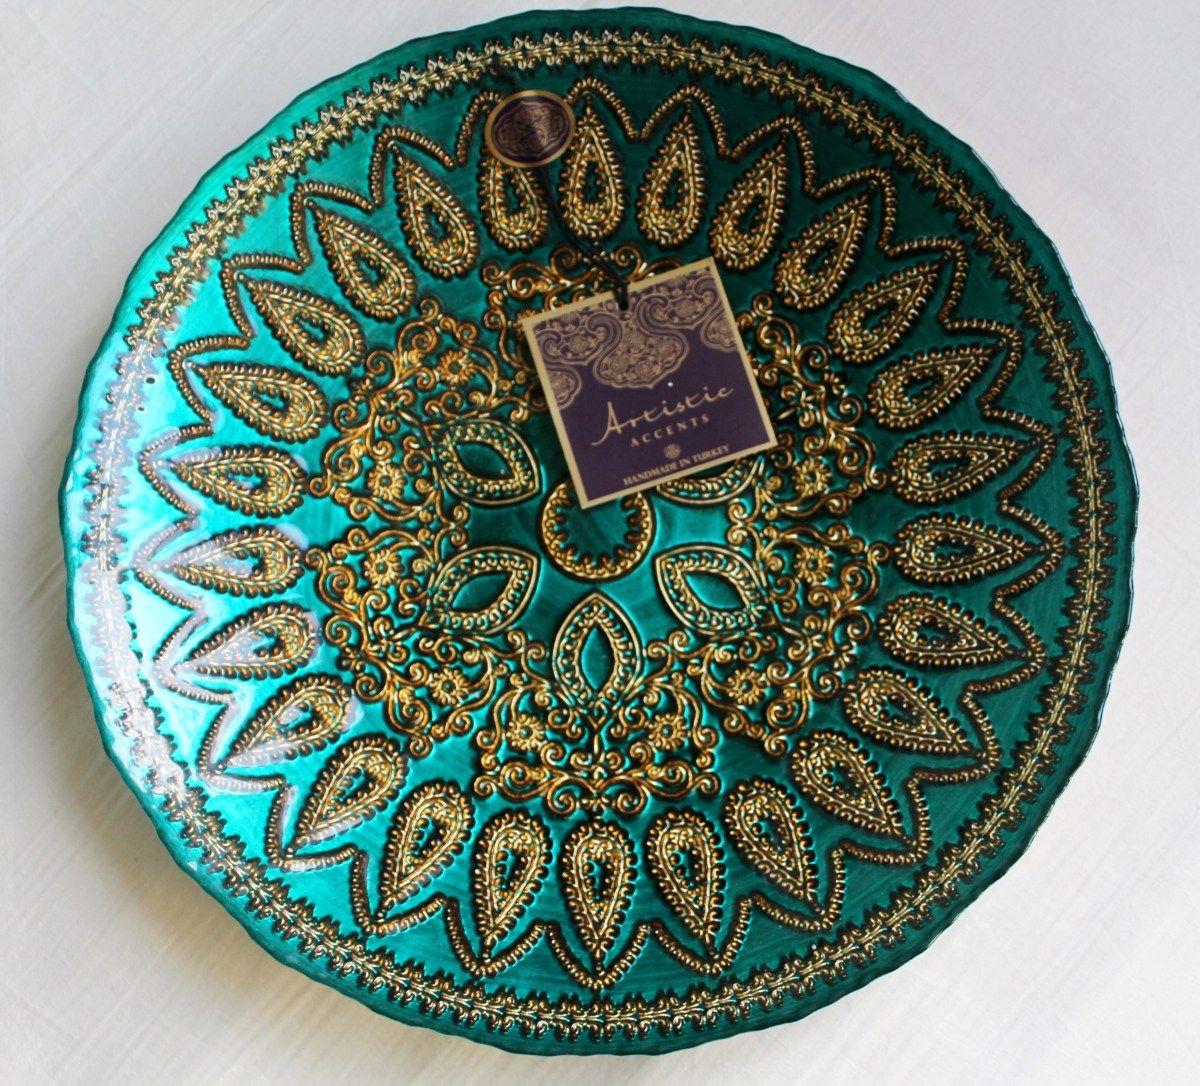 stunning handmade artistic accents turkish glass bowl in turquoise  - stunning handmade artistic accents turkish glass bowl in turquoise and goldethnic patterns